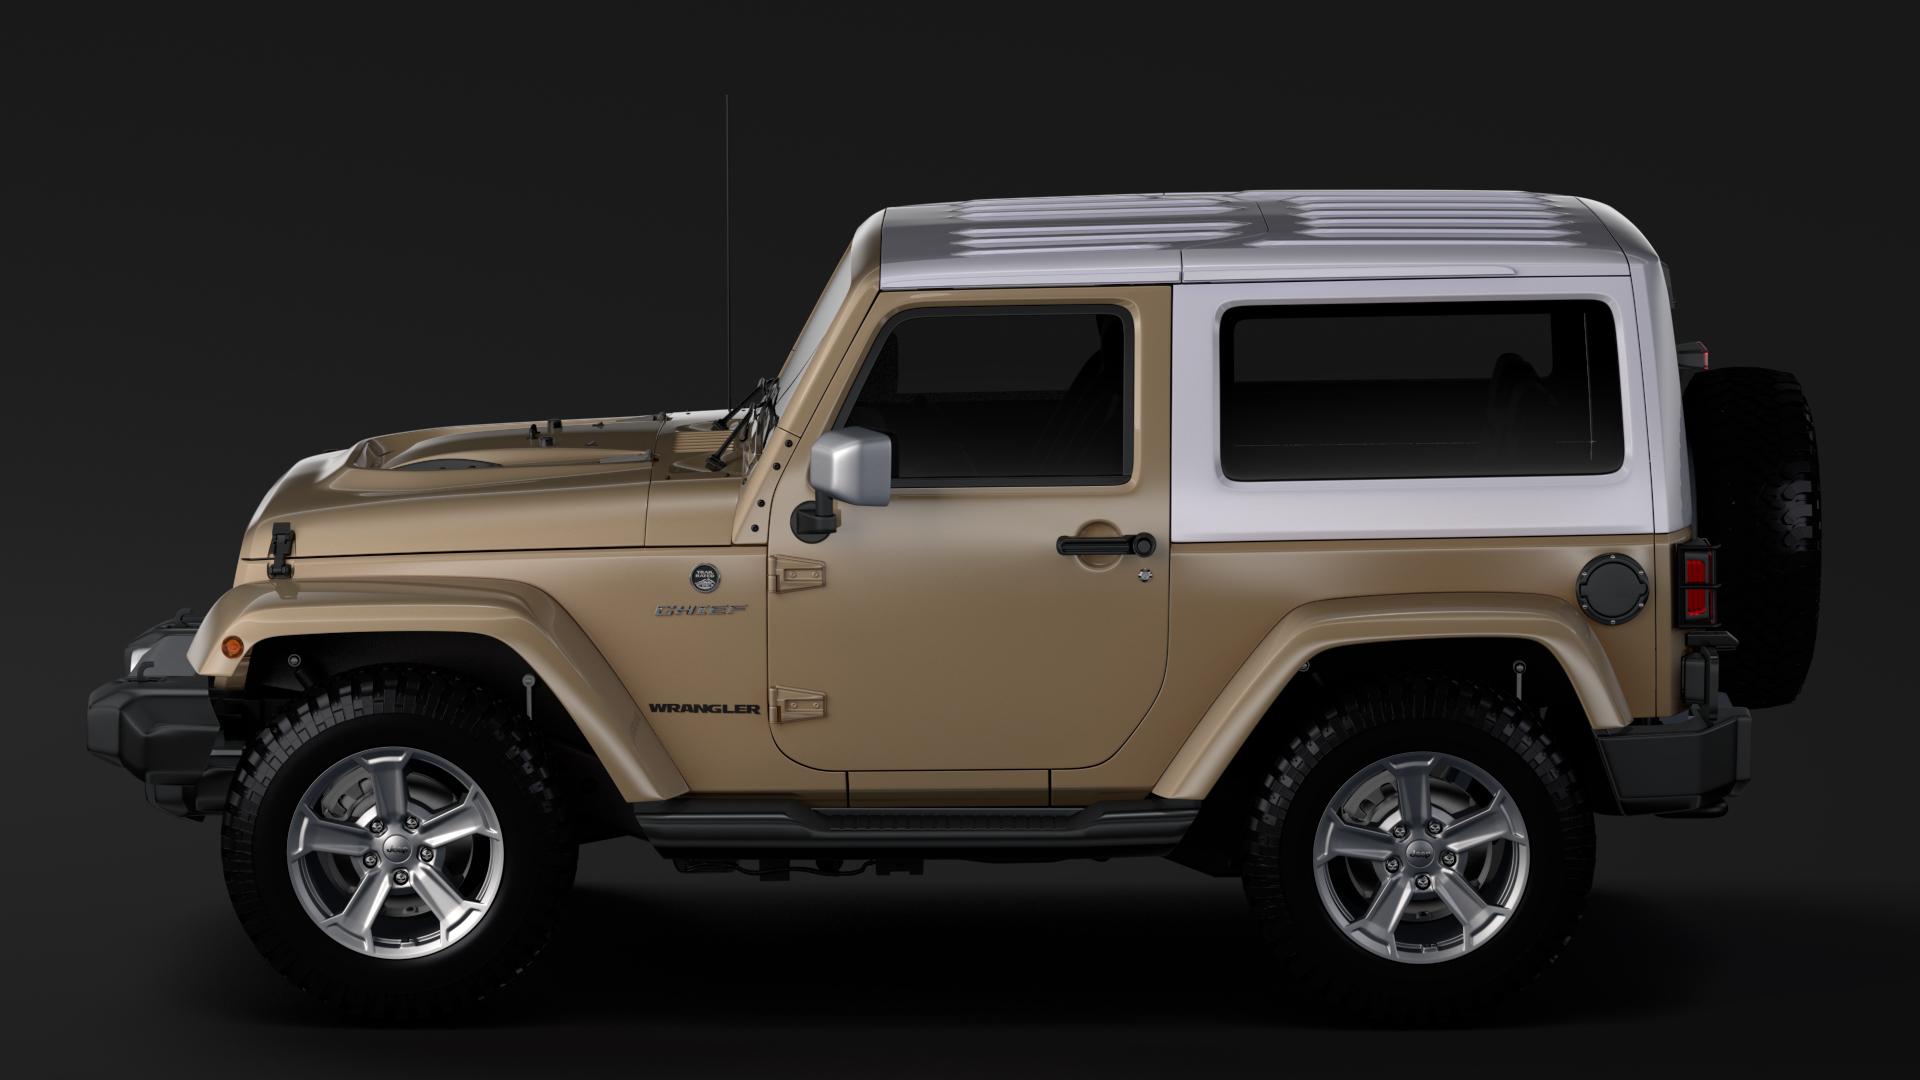 jeep wrangler chief jk 2017 3d model max fbx c4d lwo ma mb hrc xsi obj 276882